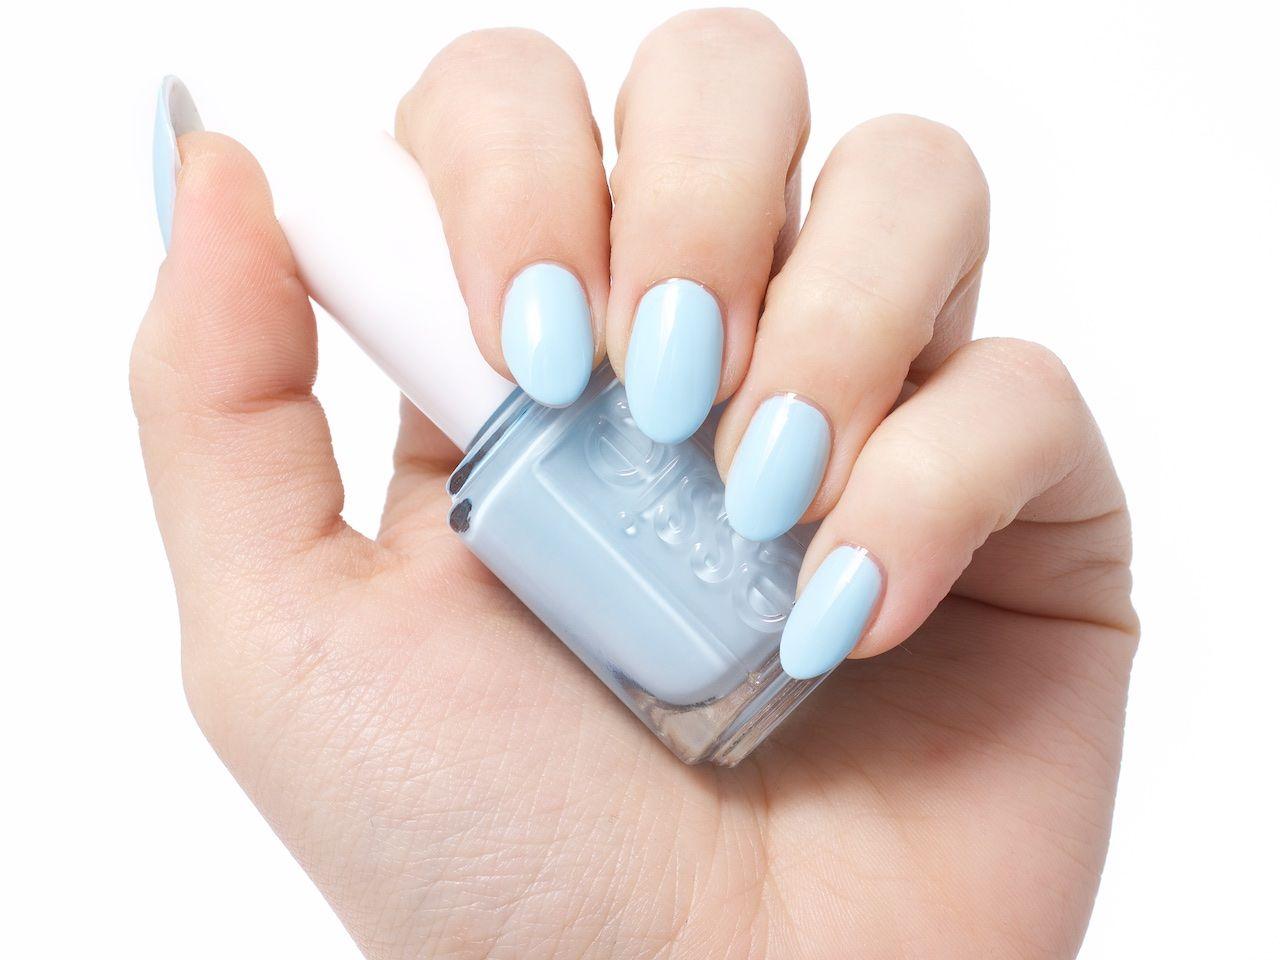 Essie Summer 2017 Nail Polish in Blue-La-La   Nails   Pinterest ...